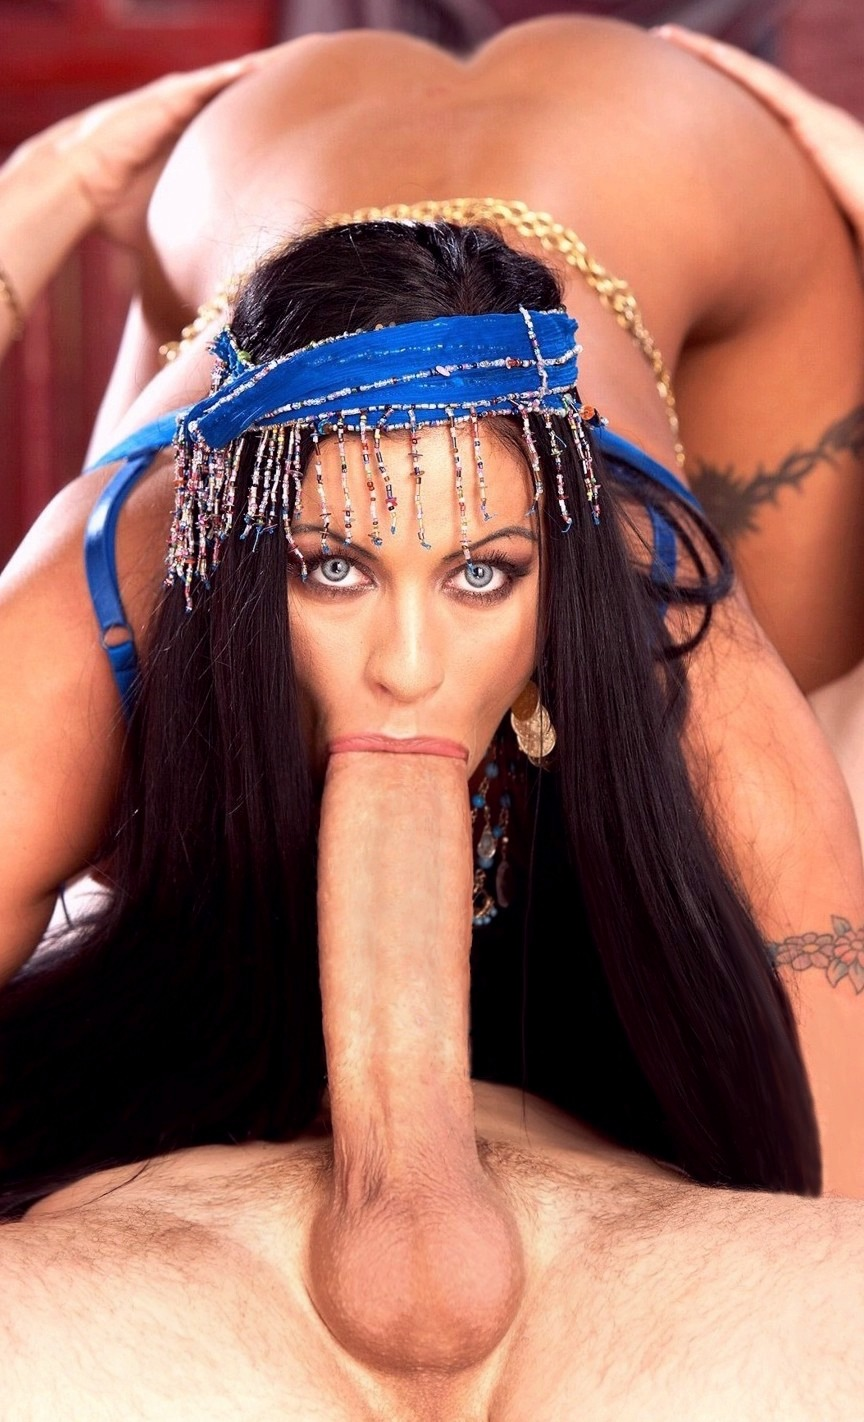 Booty shaking download les photos sexy  pictures ebony sex vida guerra porn clip